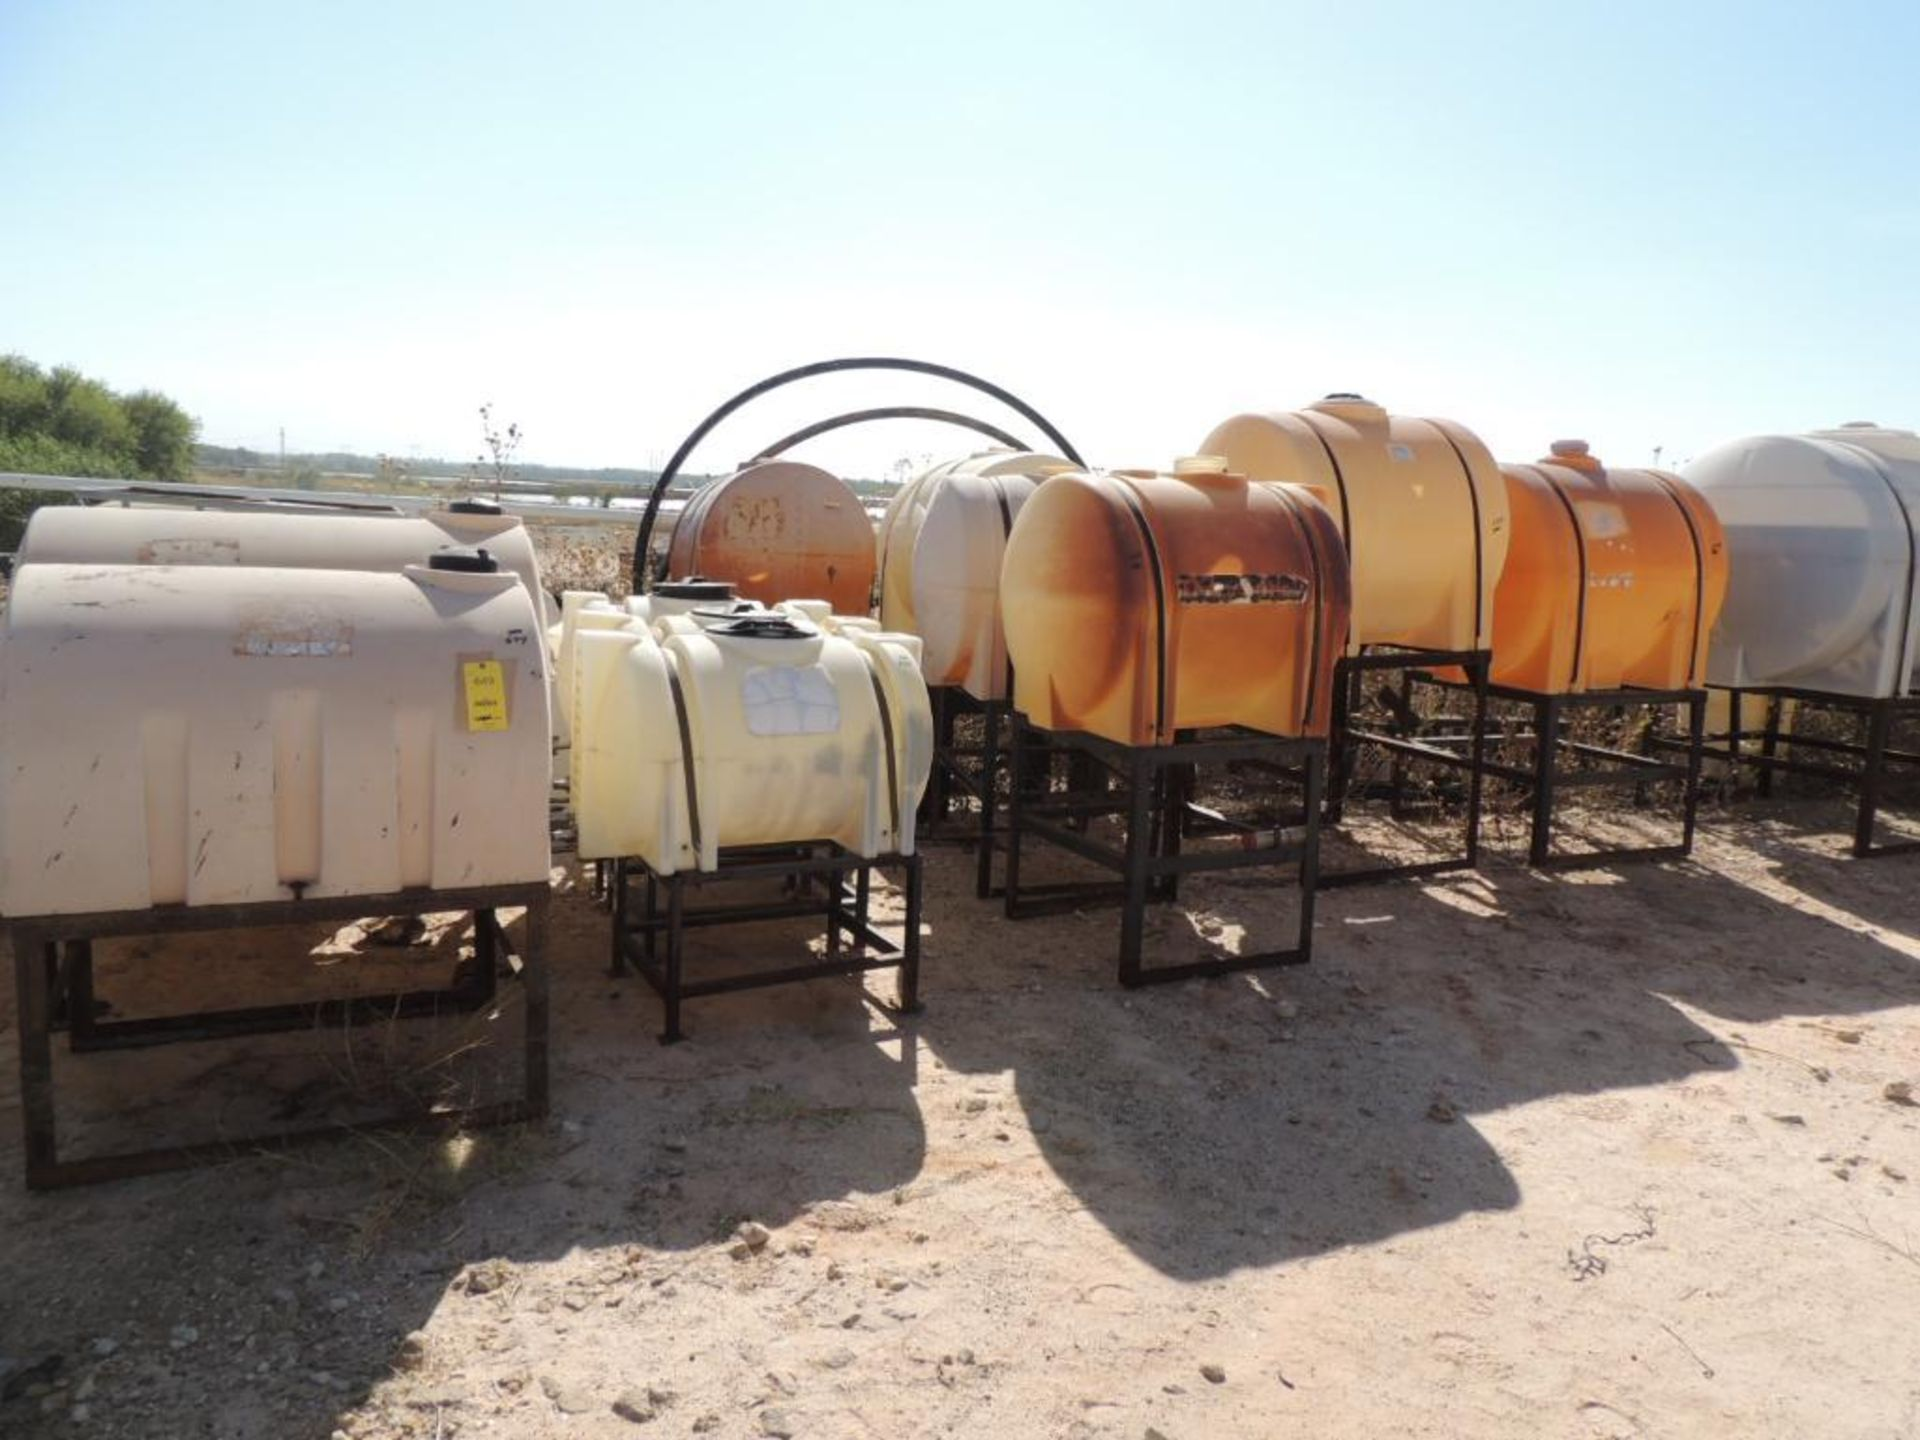 LOT: (10) Poly Tanks - (1) 535 Gallon, (2) 225 Gallon, (1) 220 Gallon, (3) 130 Gallon, (3) 65 Gallon